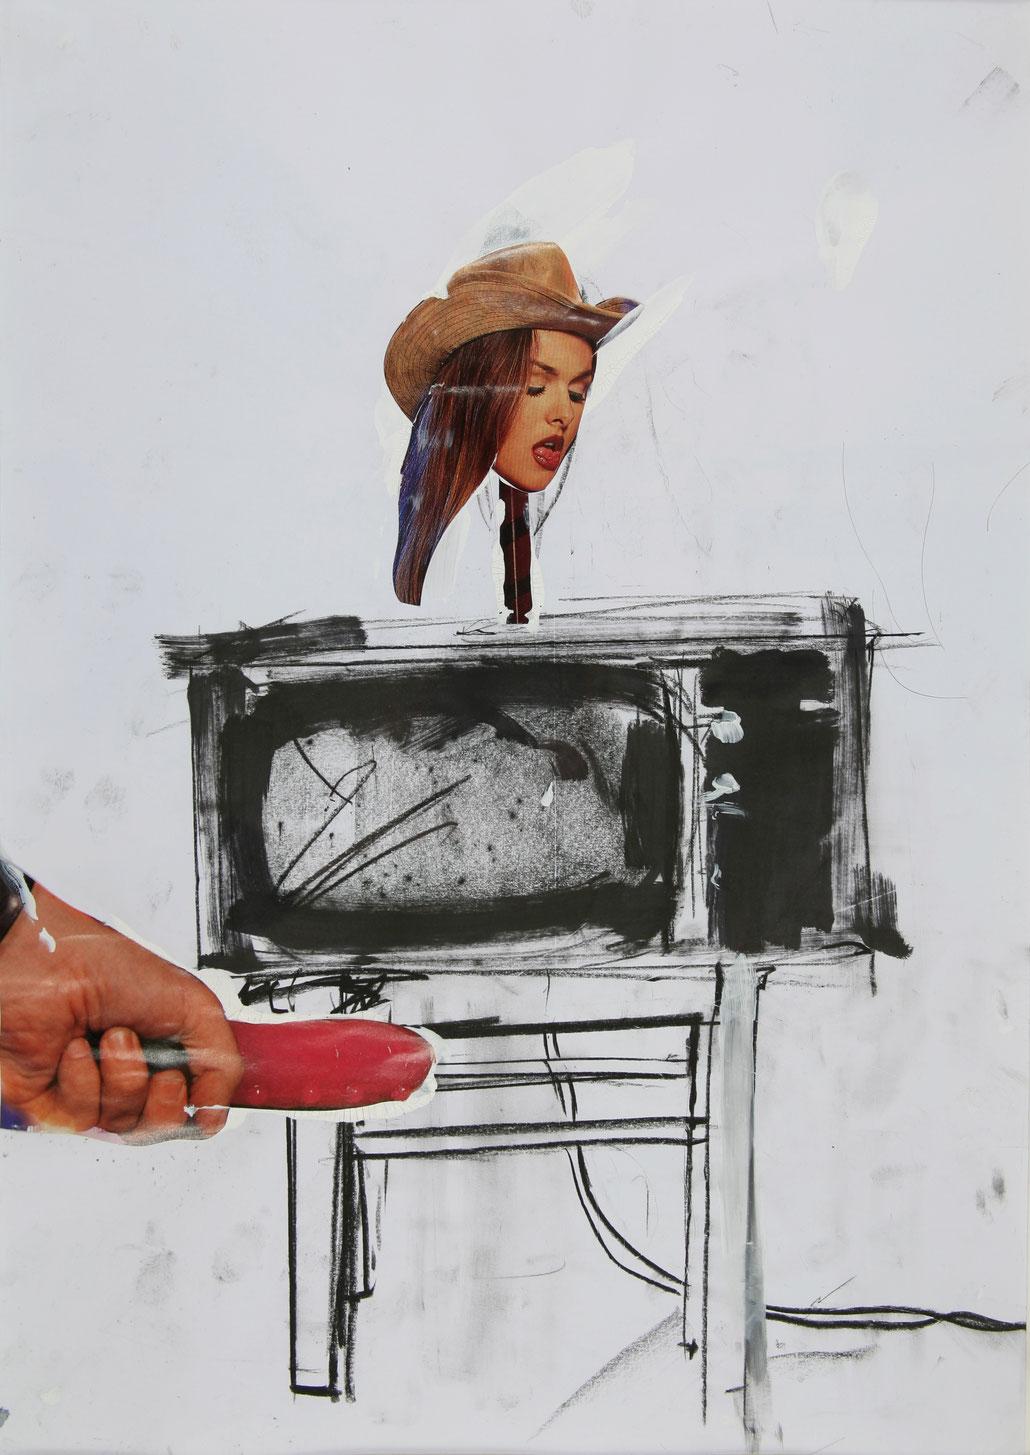 Erik van Lieshout art from the Dutch artist Erik van Lieshout in our online shop